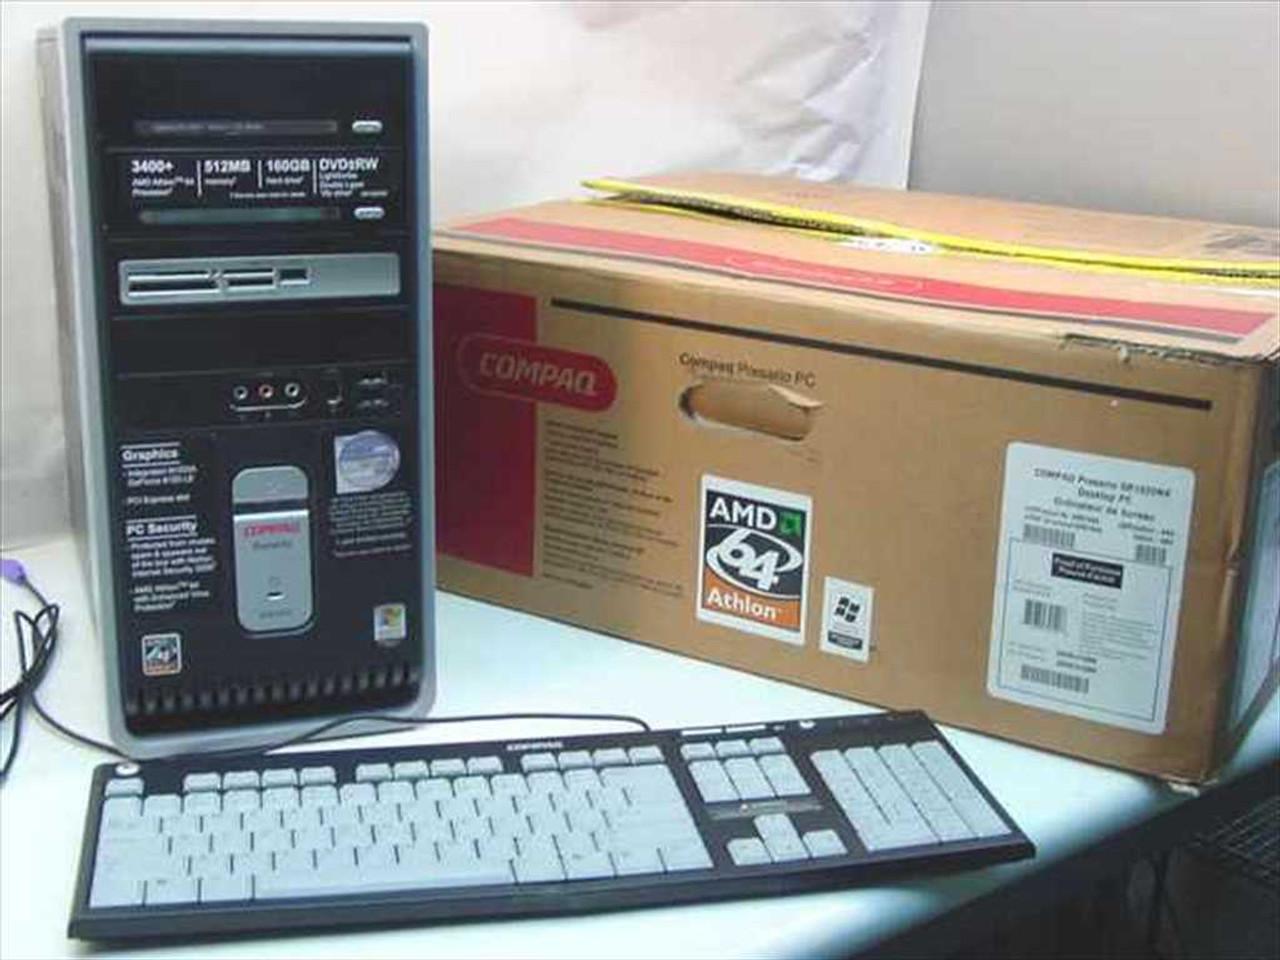 Compaq Presario SR1820NX Desktop PC Product Specifications